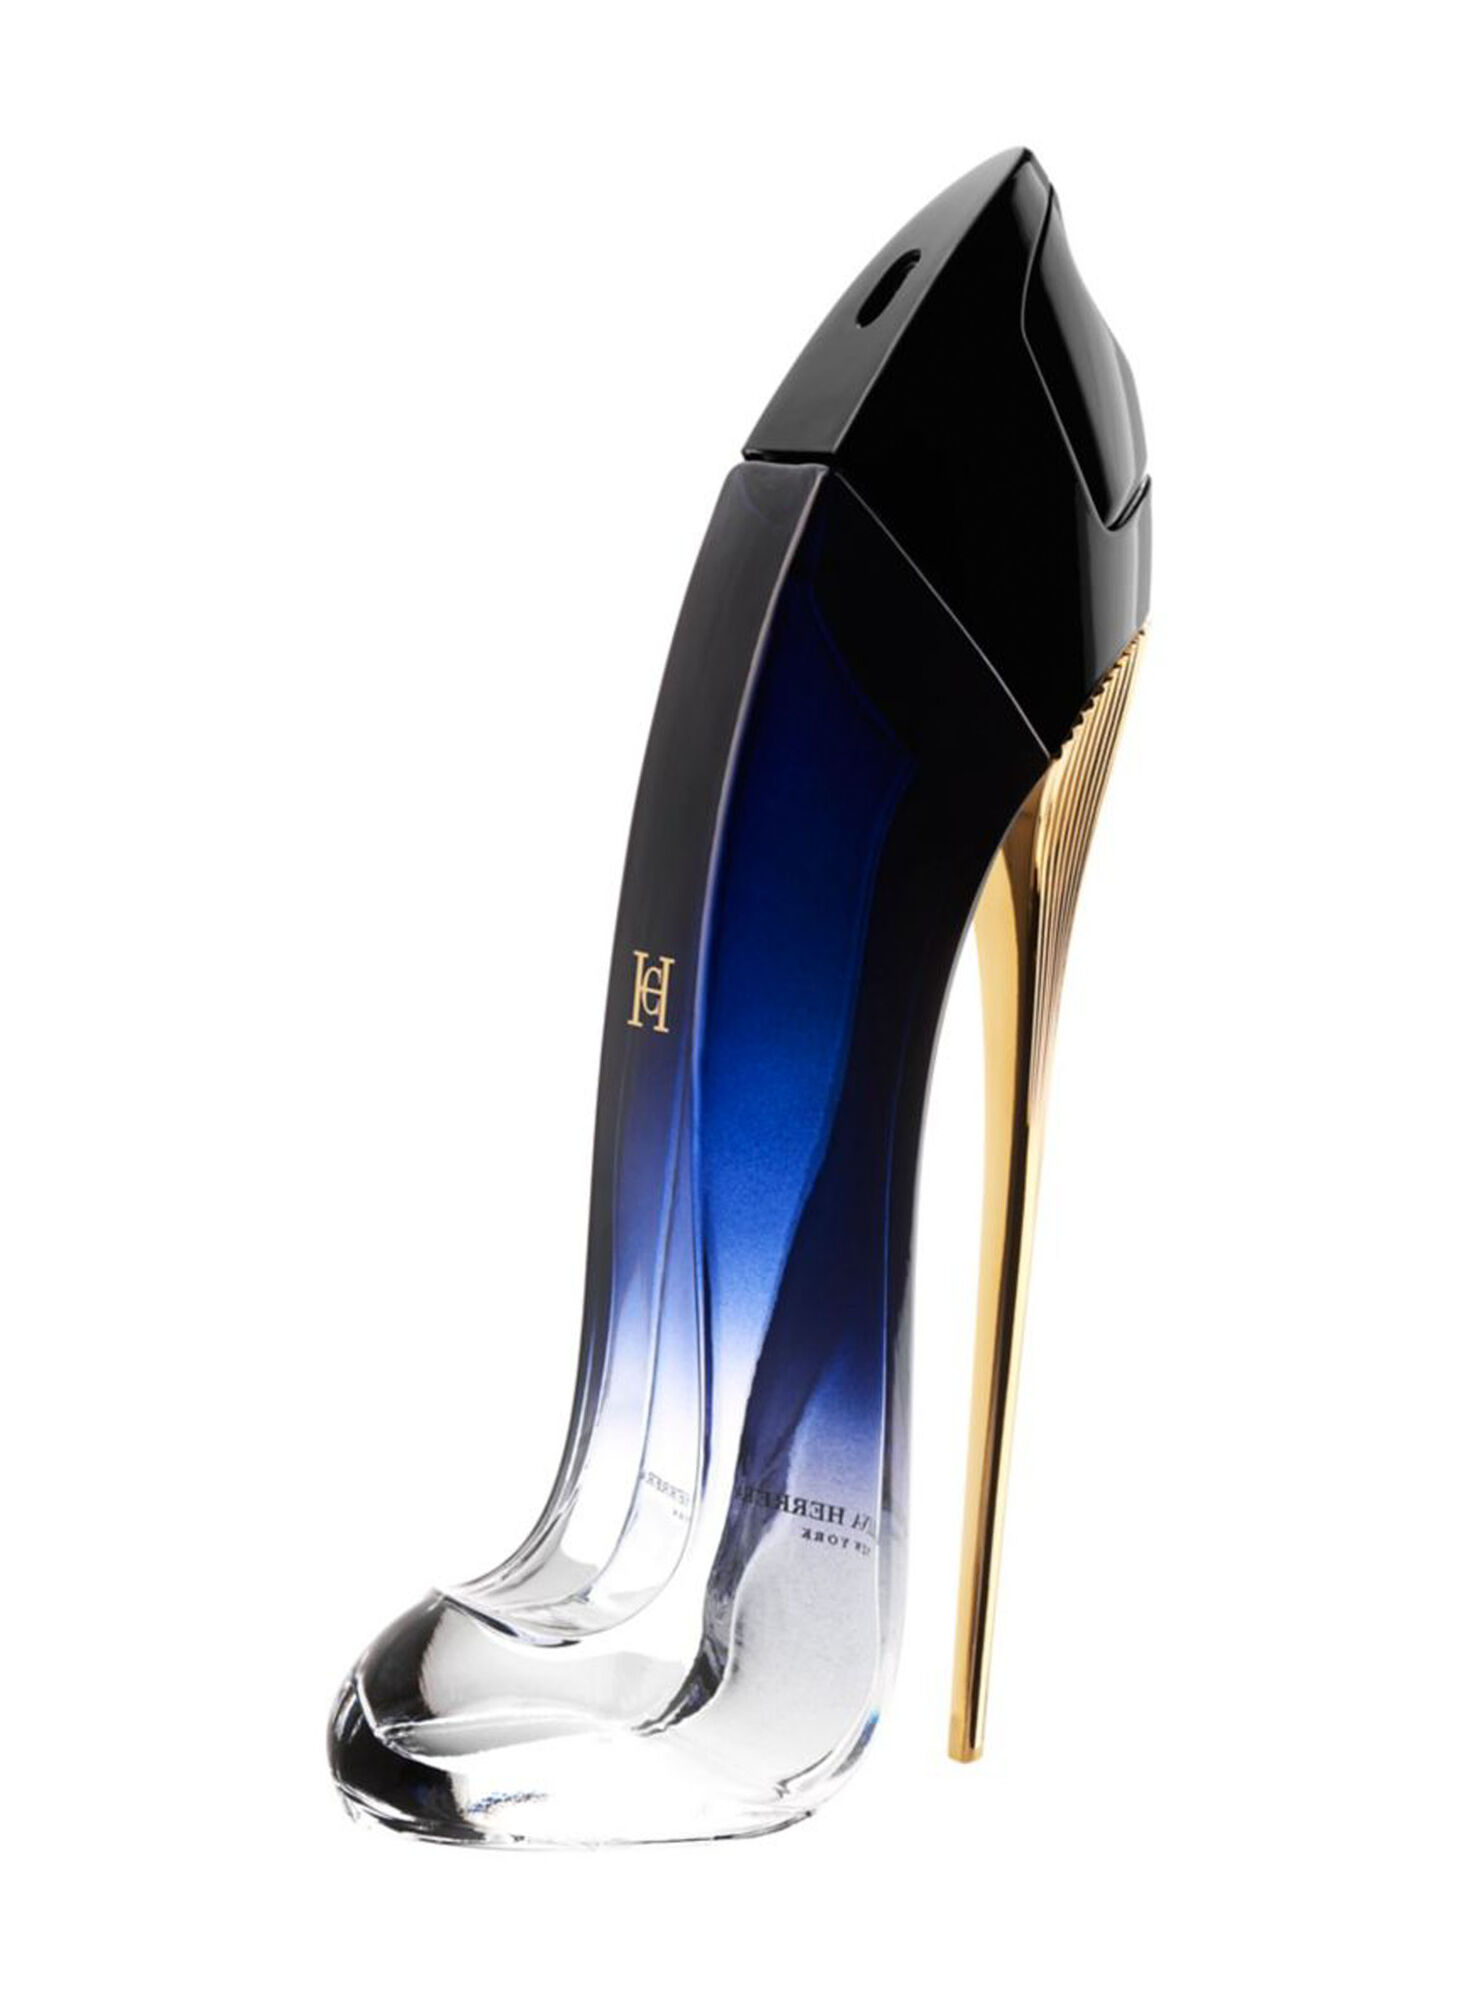 945ddc6e4d Images. Perfume Carolina Herrera Good Girl Légère Femenina EDP 50 ml ...